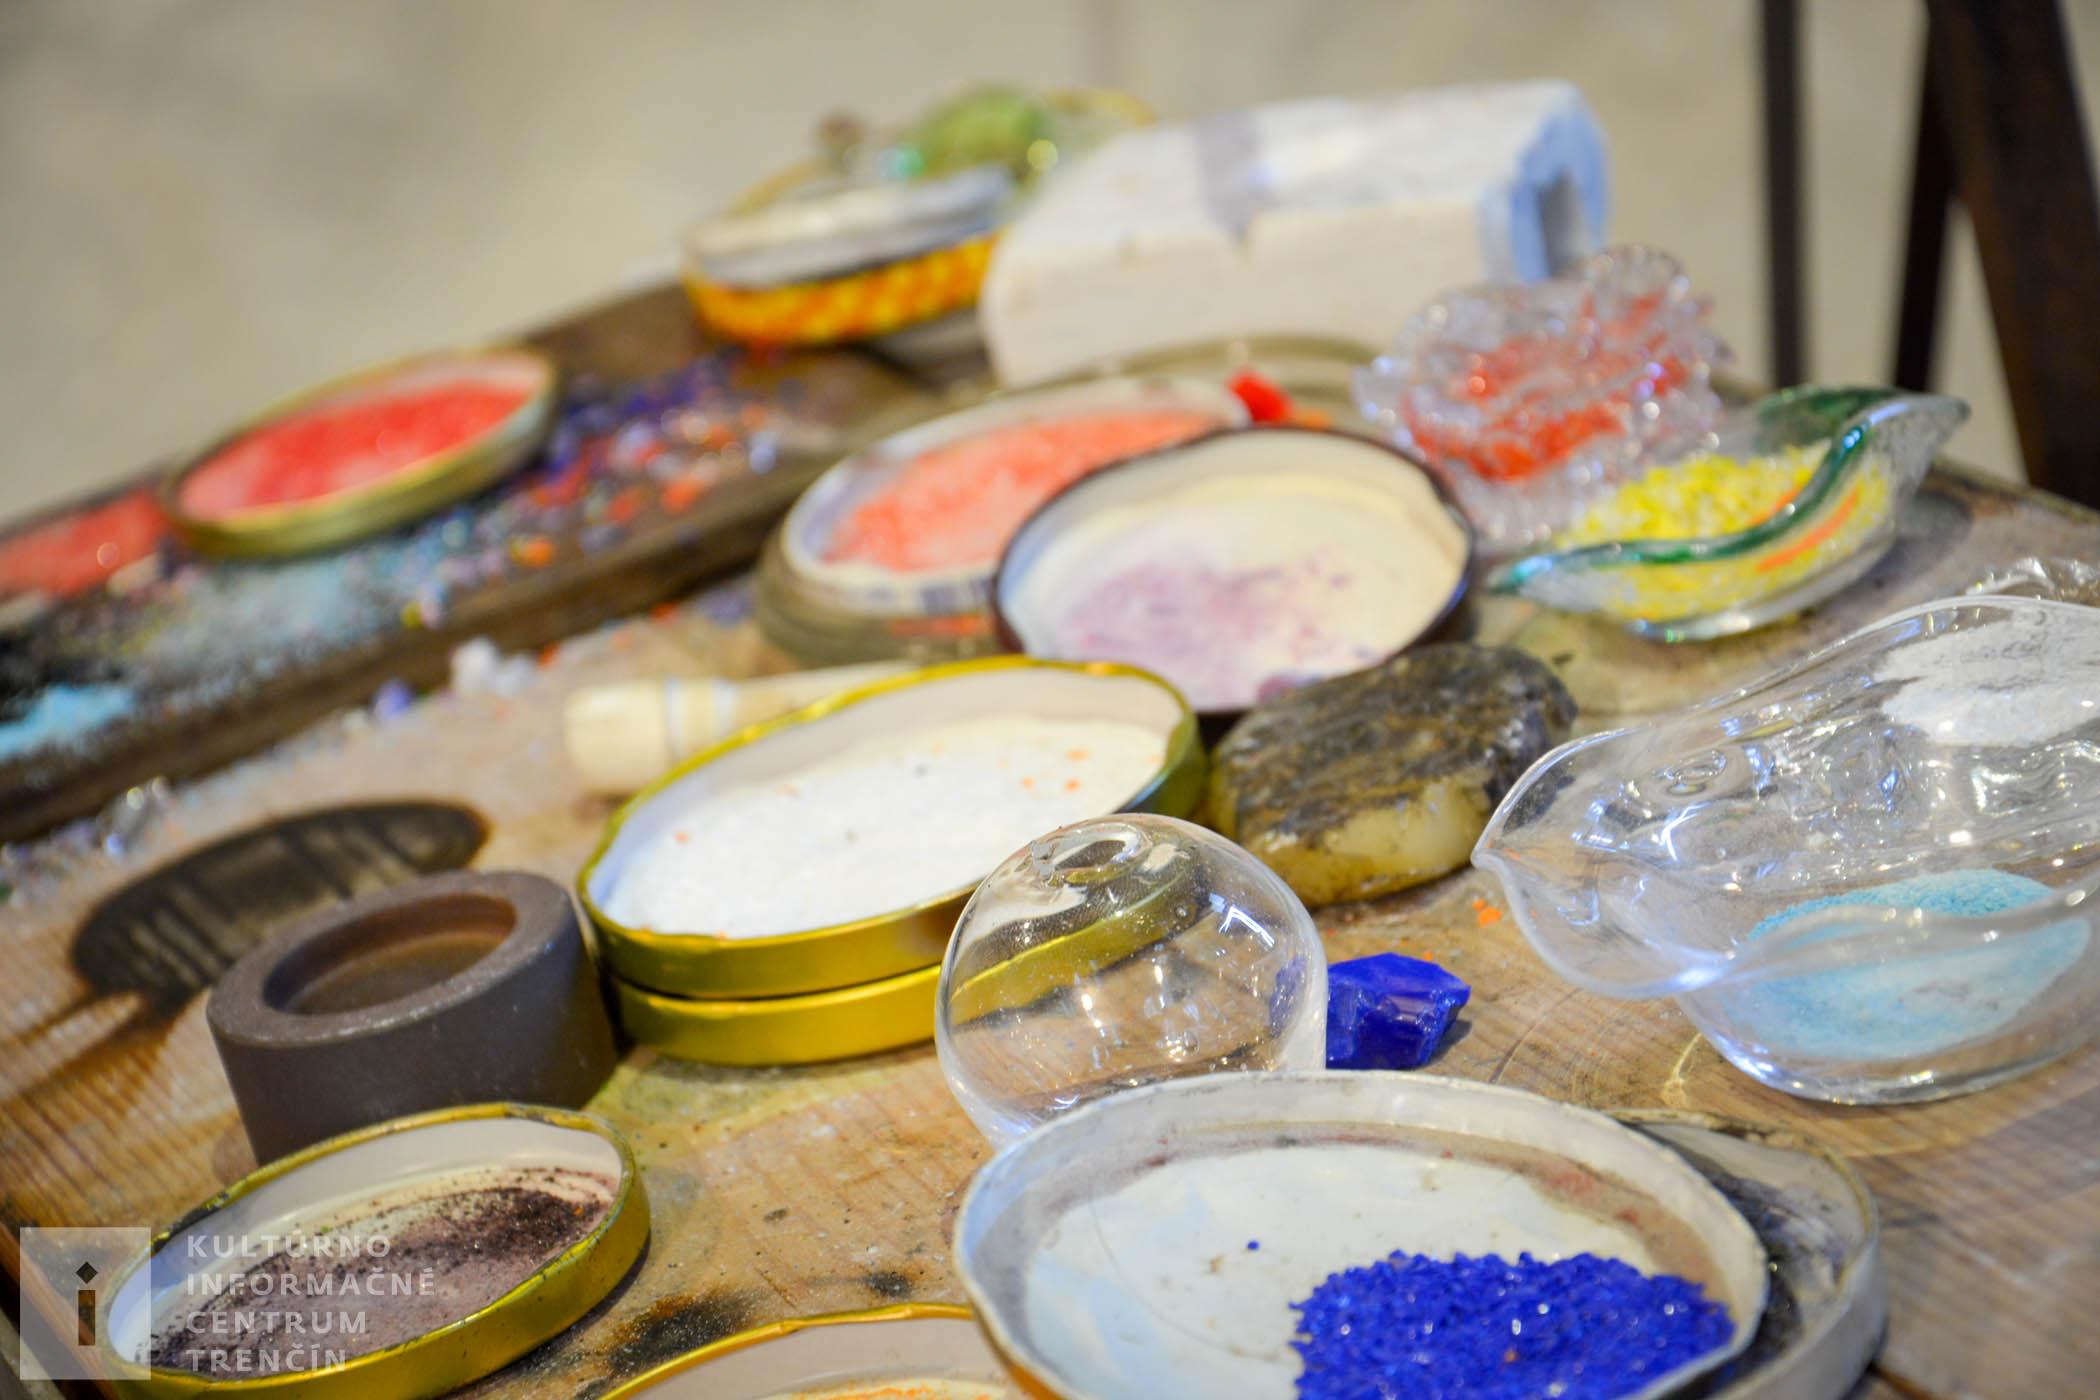 Farebné črepinky na dekoráciu/Colored shards for decoration of products